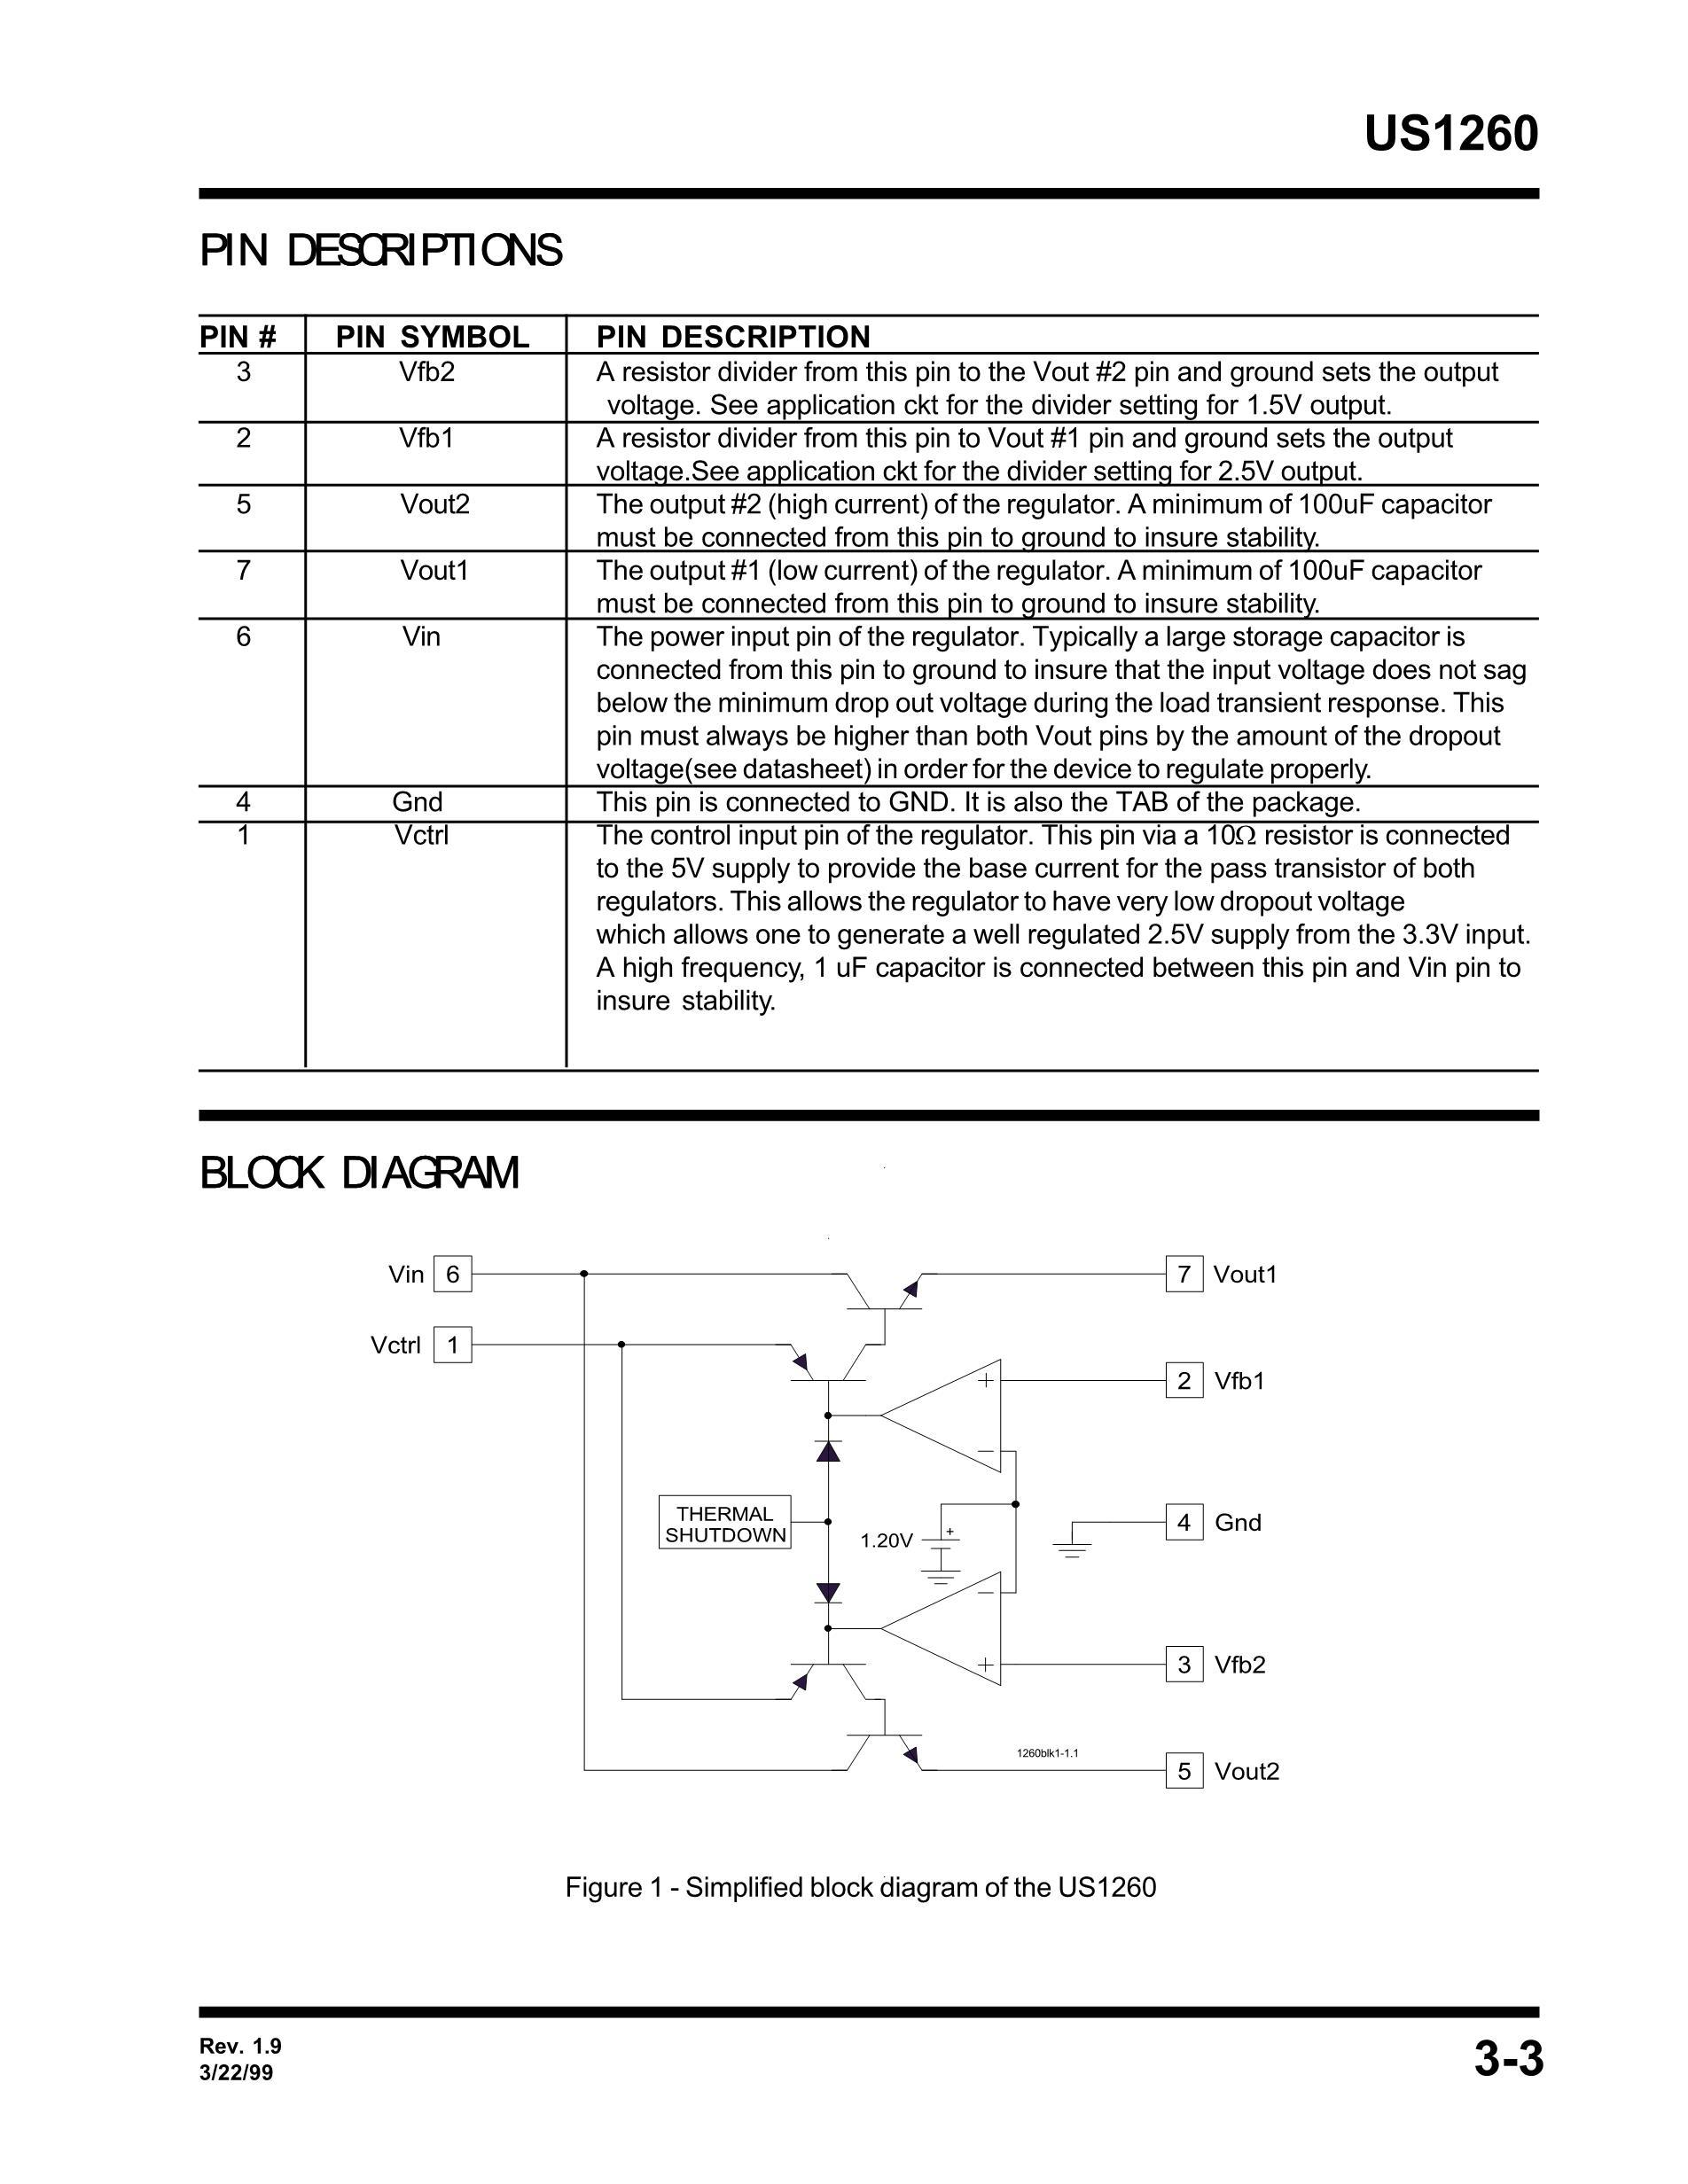 US1260OOCM's pdf picture 3